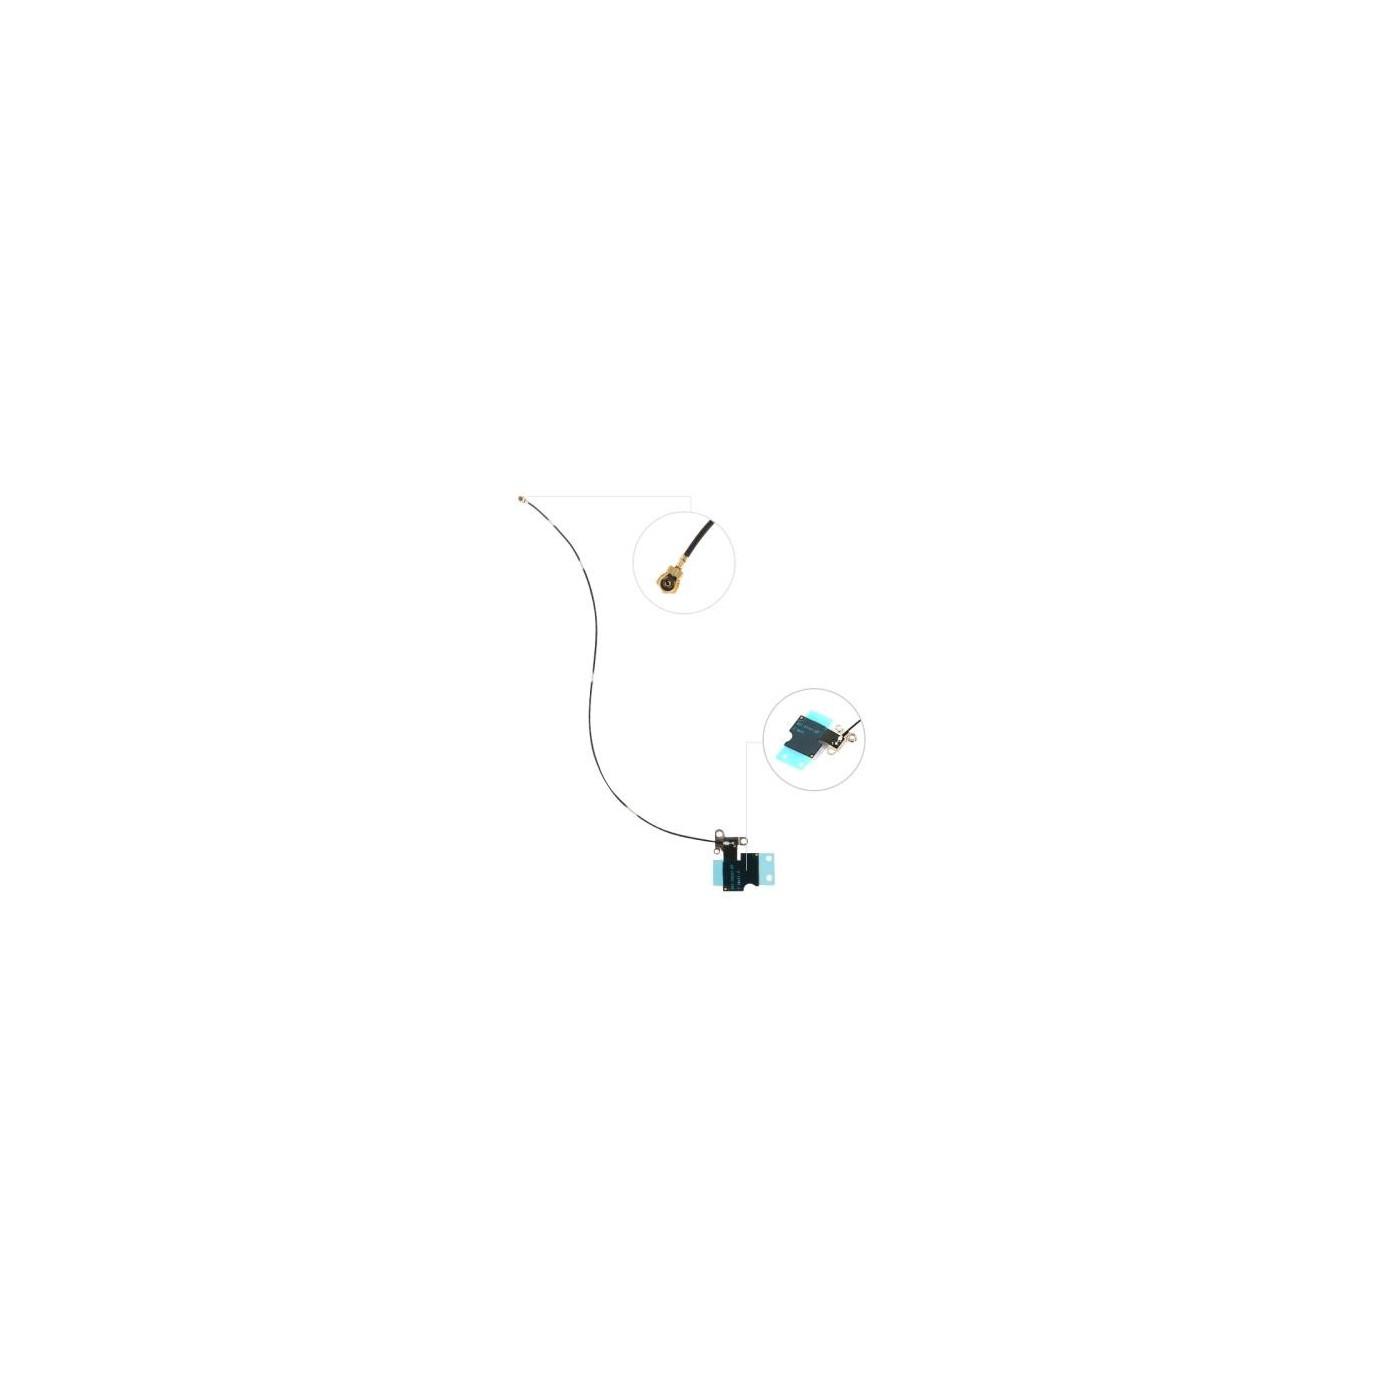 WiFi-Antennenmodul für iPhone 6s Plus WI-FI flaches Flex-Funksignal